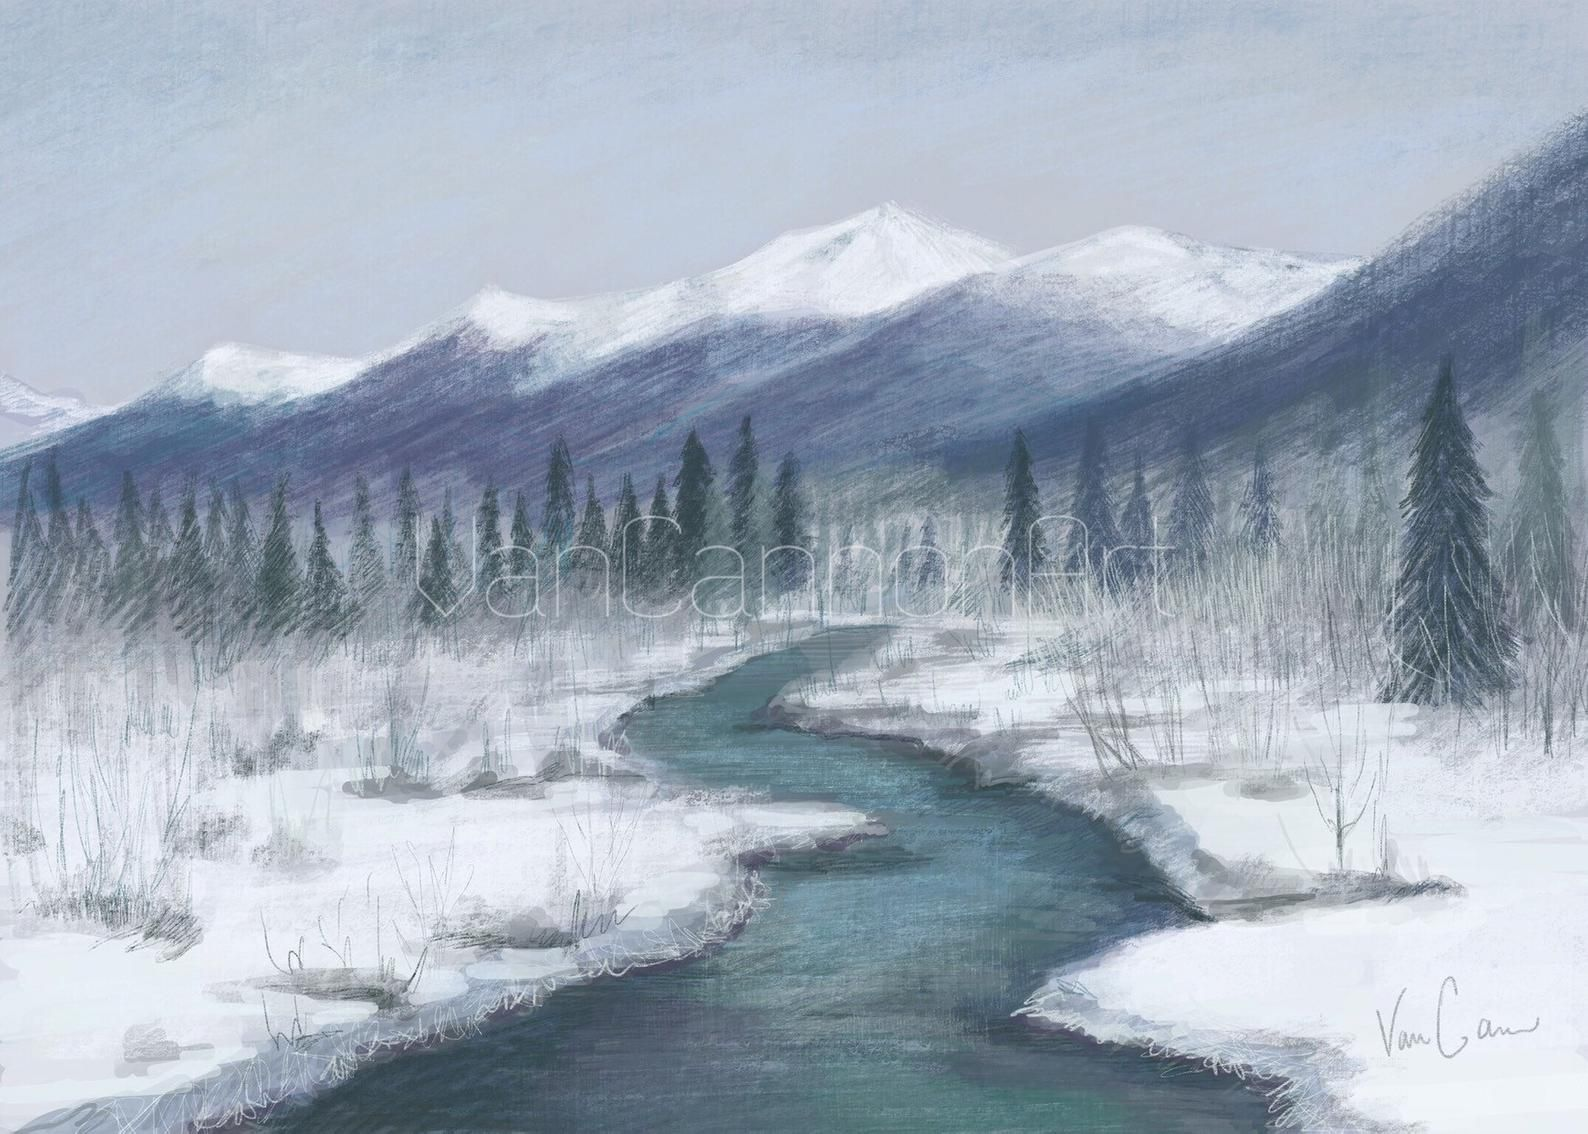 Snowy Mountain Downloadable Wall Art Mountain Digital Print Homedecor Printables Landscape Alaska Art Landscape Prints Wall Art